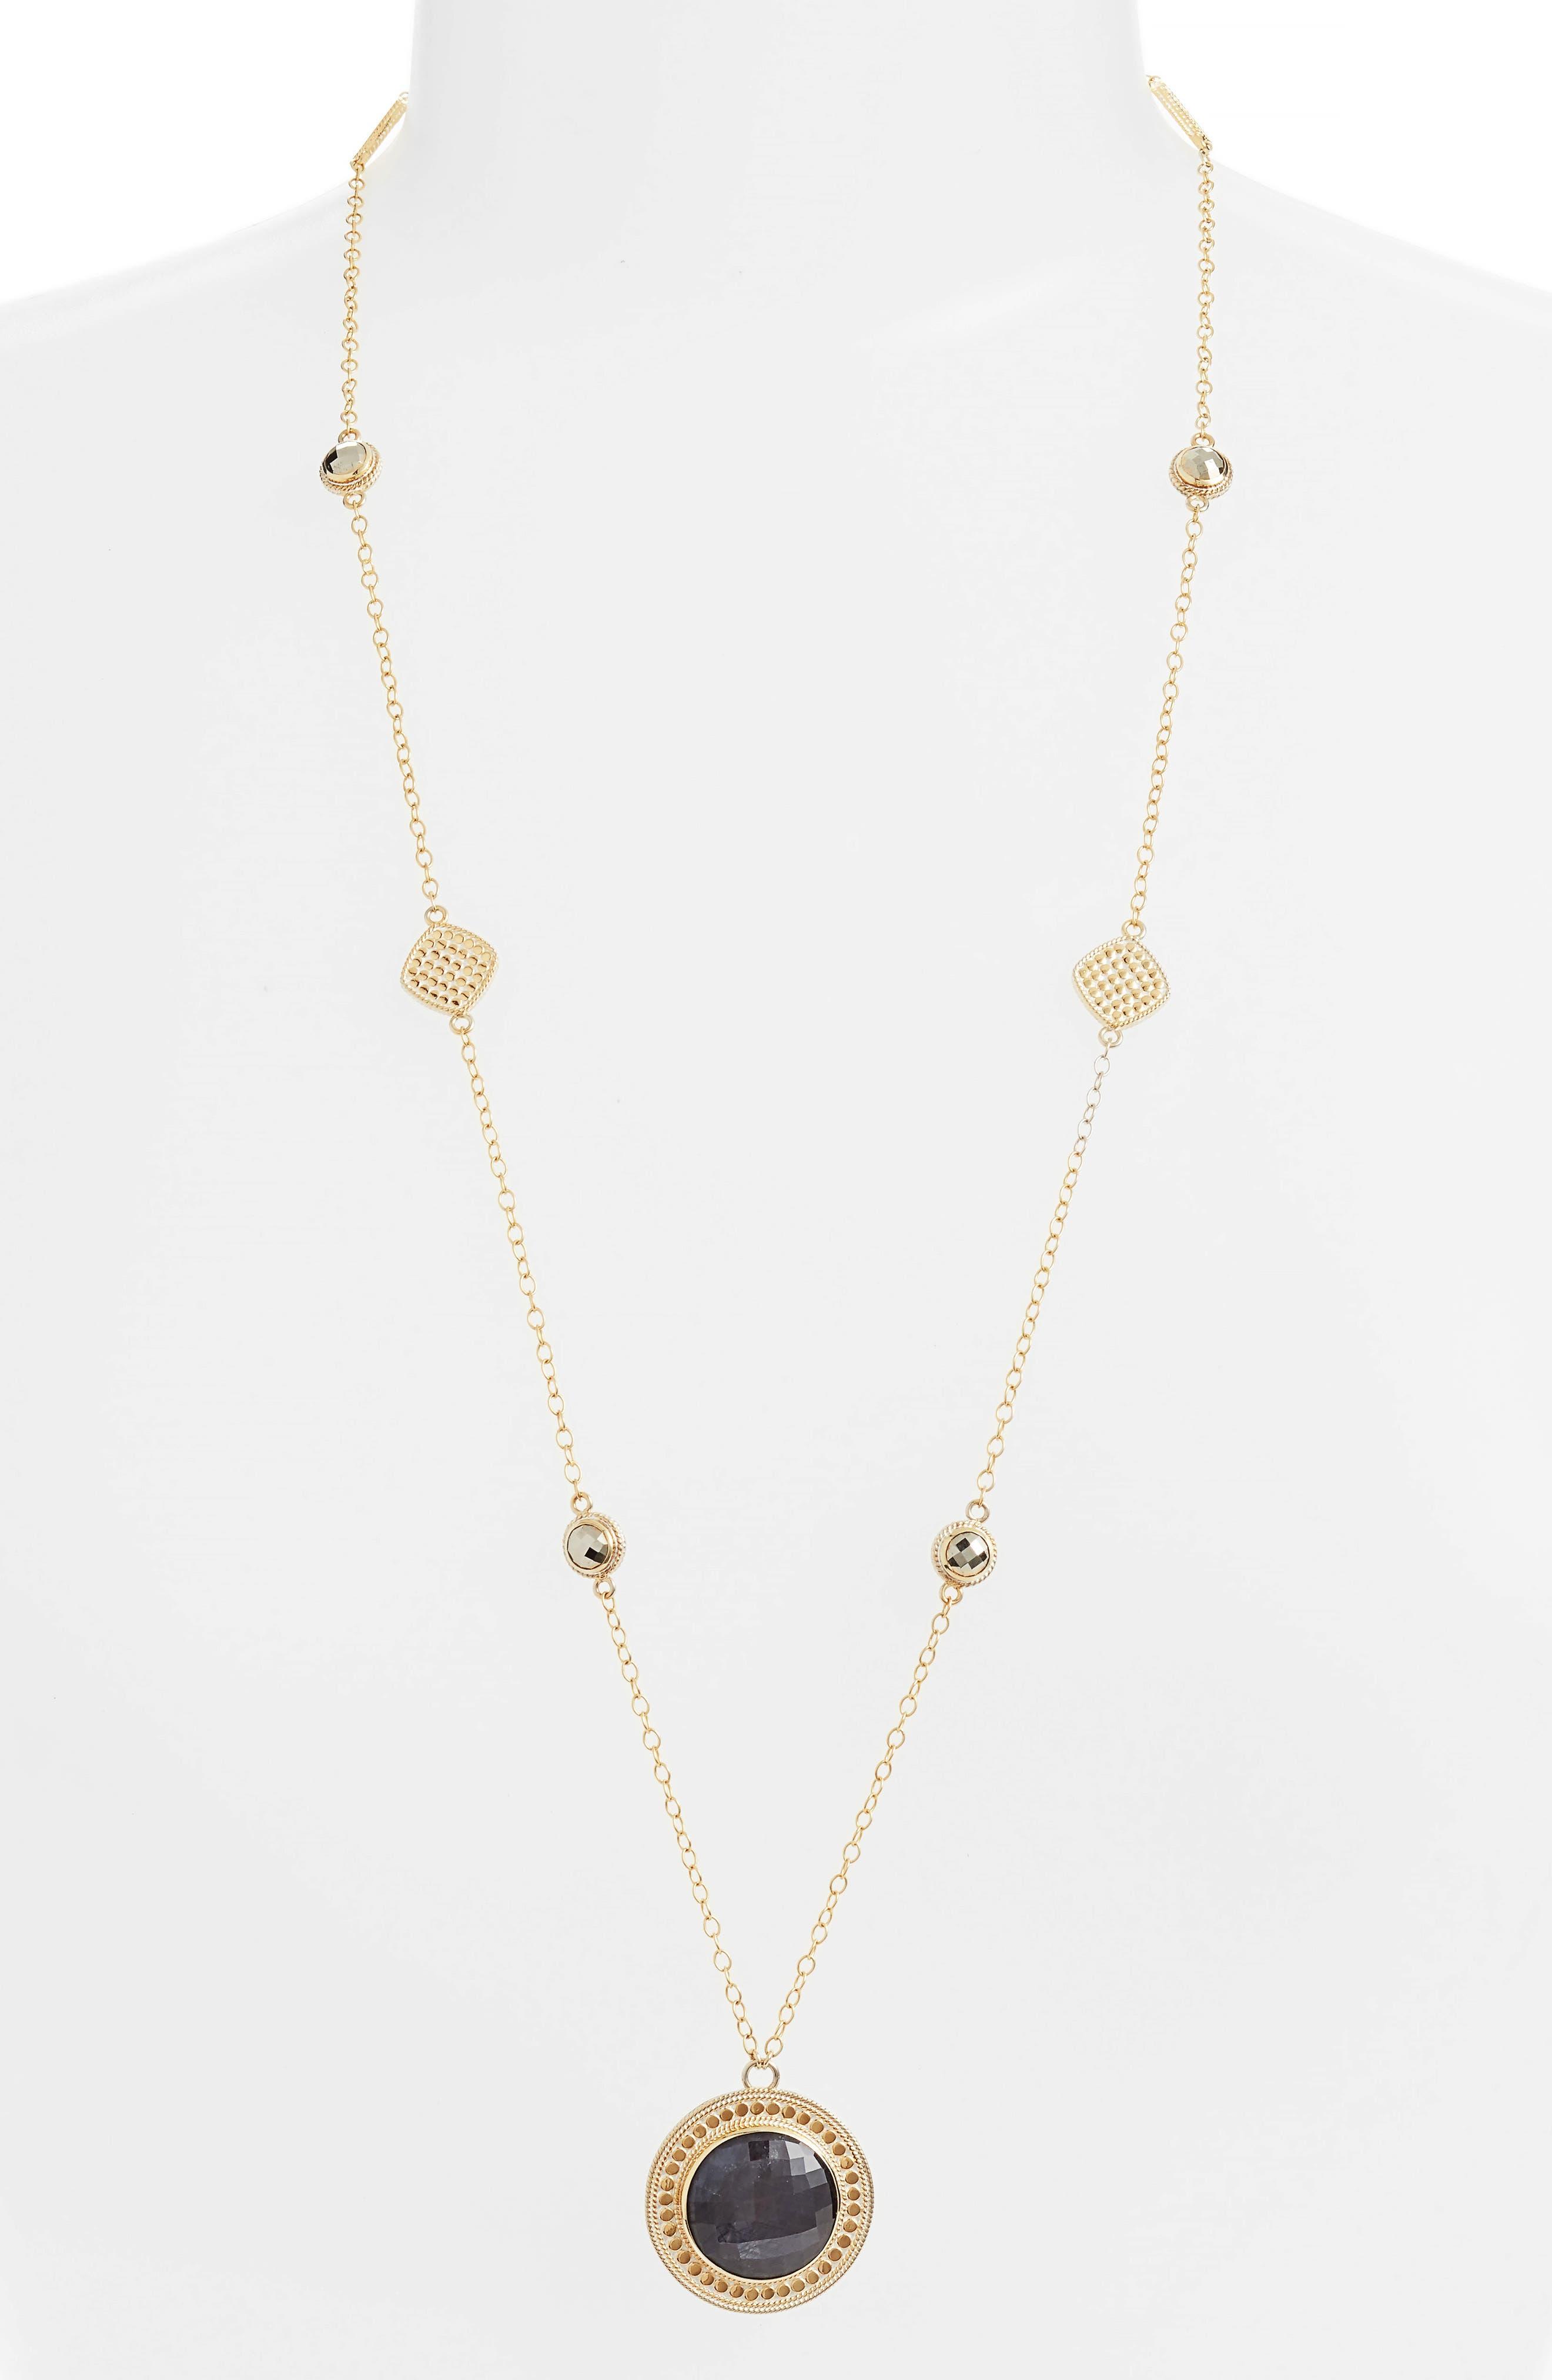 Main Image - Anna Beck Grey Sapphire & Pyrite Long Pendant Necklace